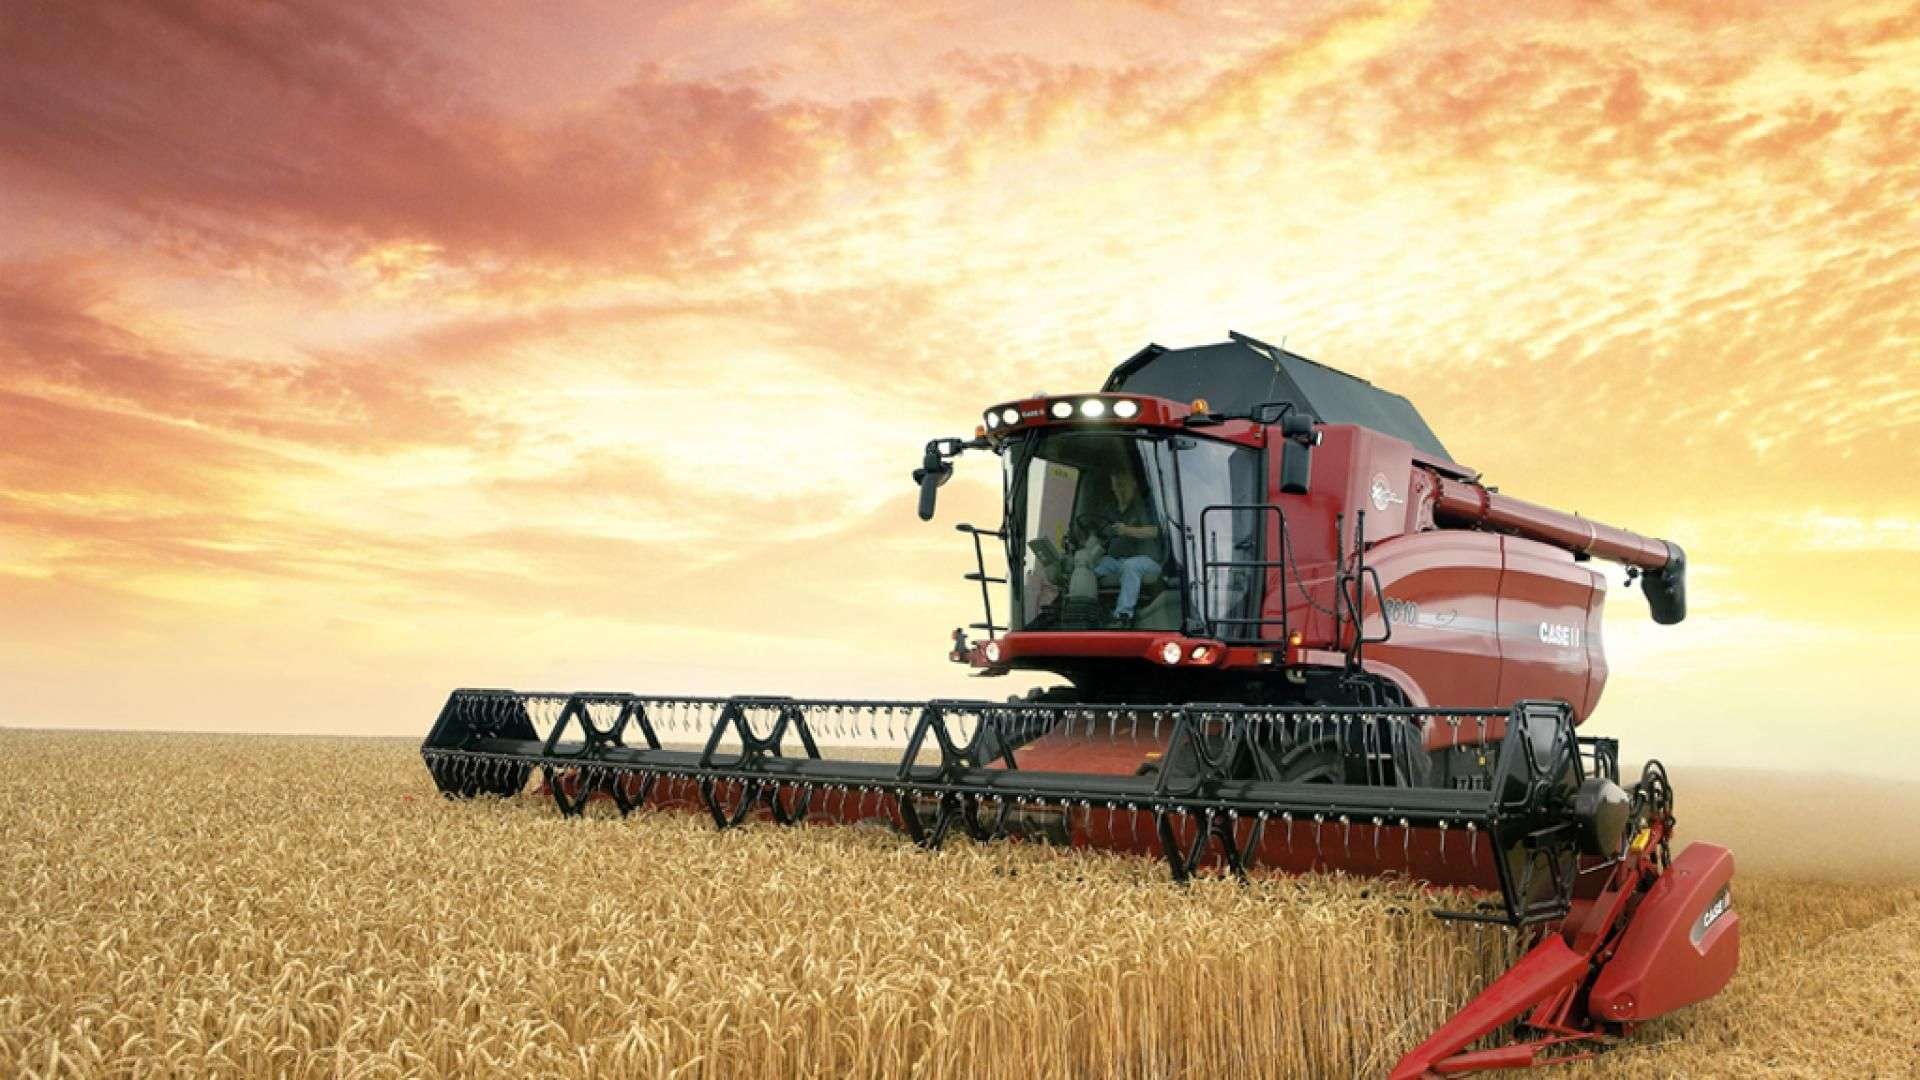 Farming Desktop Wallpapers Farm Equipment Combine harvester 1920x1080